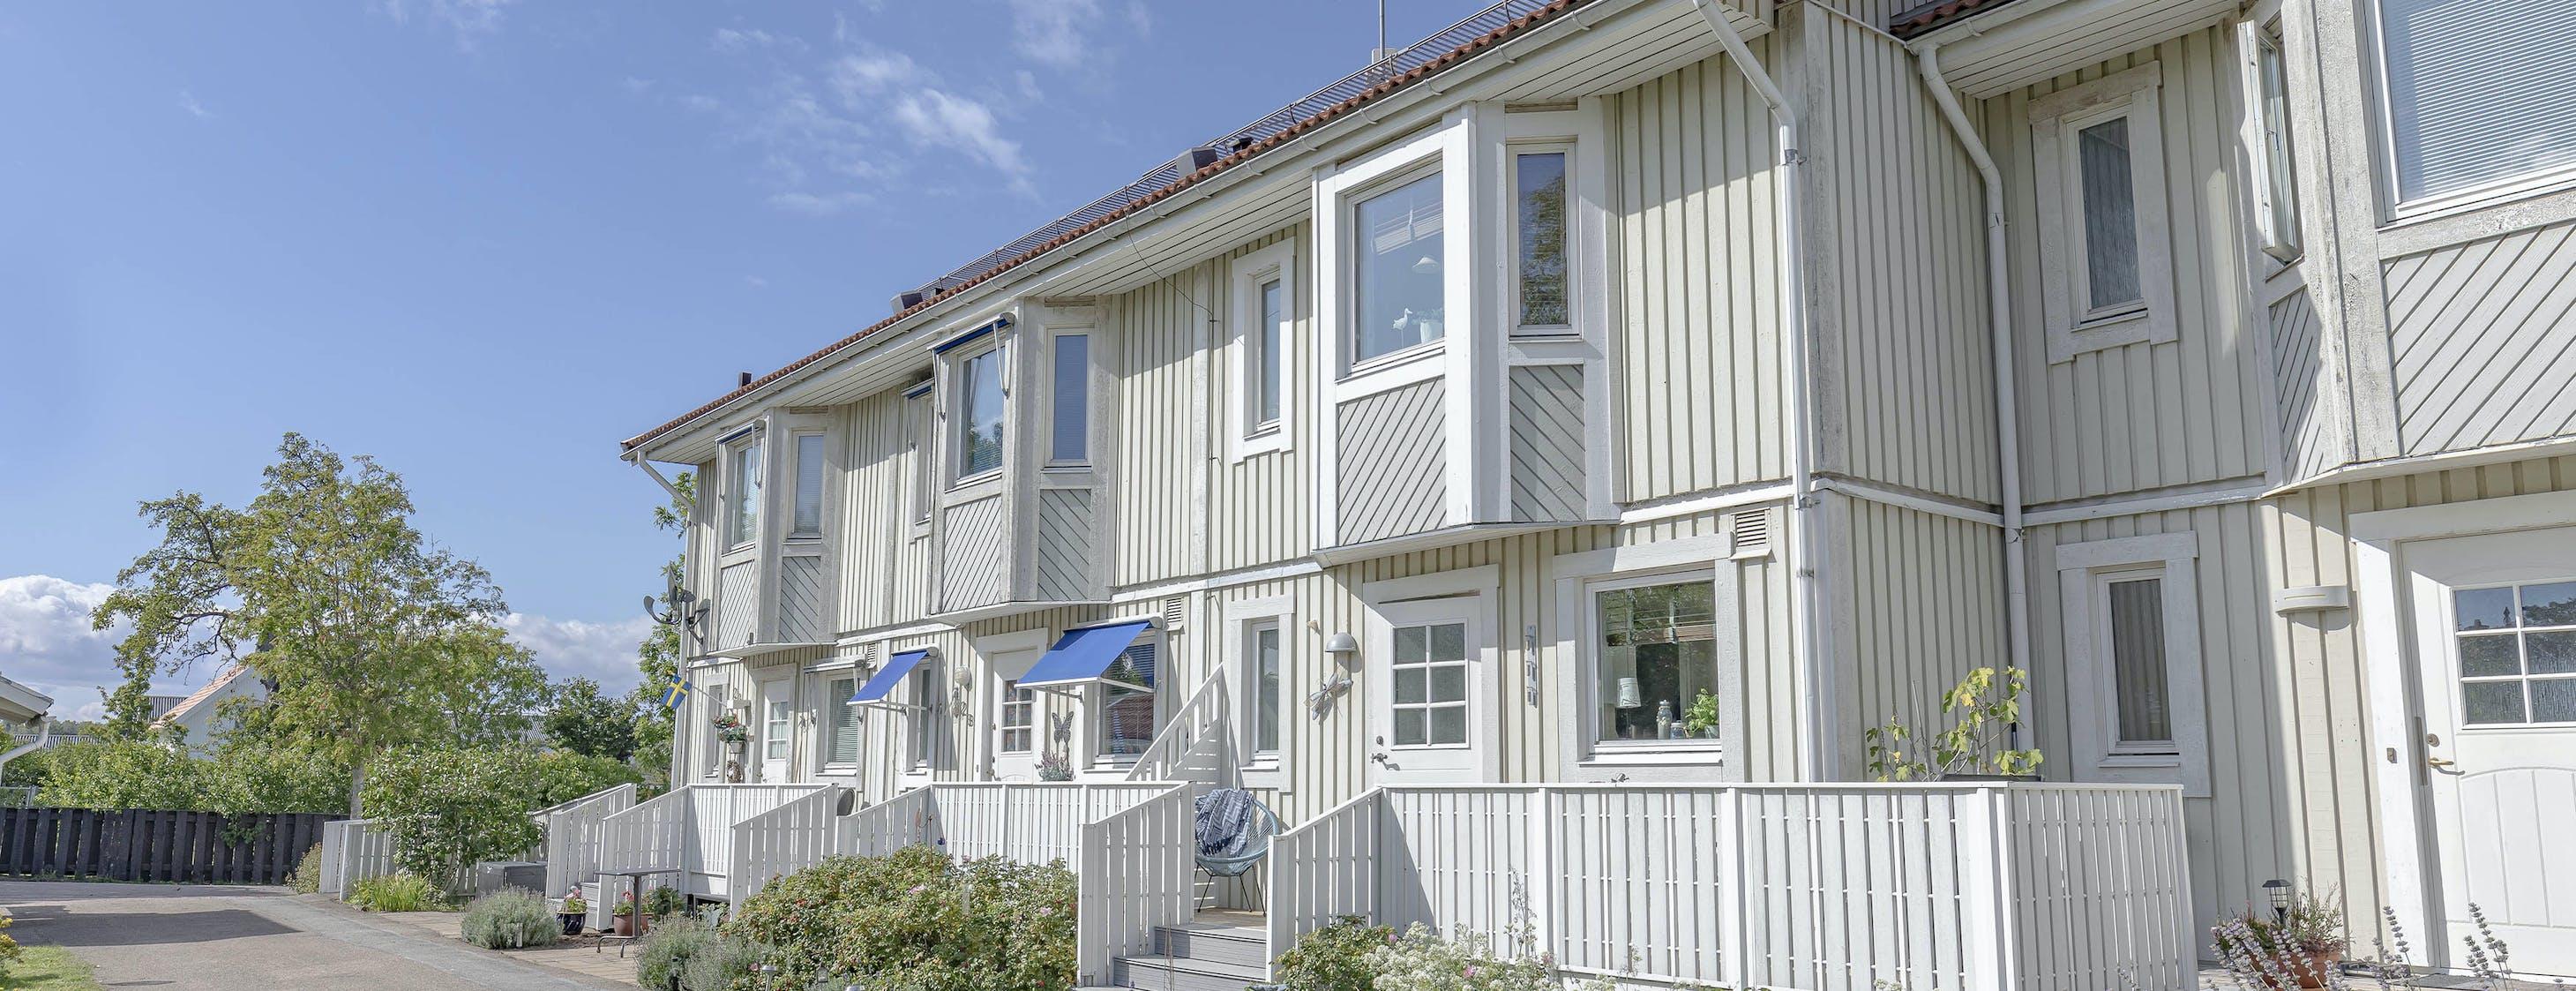 Skurkvarnsvägen 2C Köpingsvik